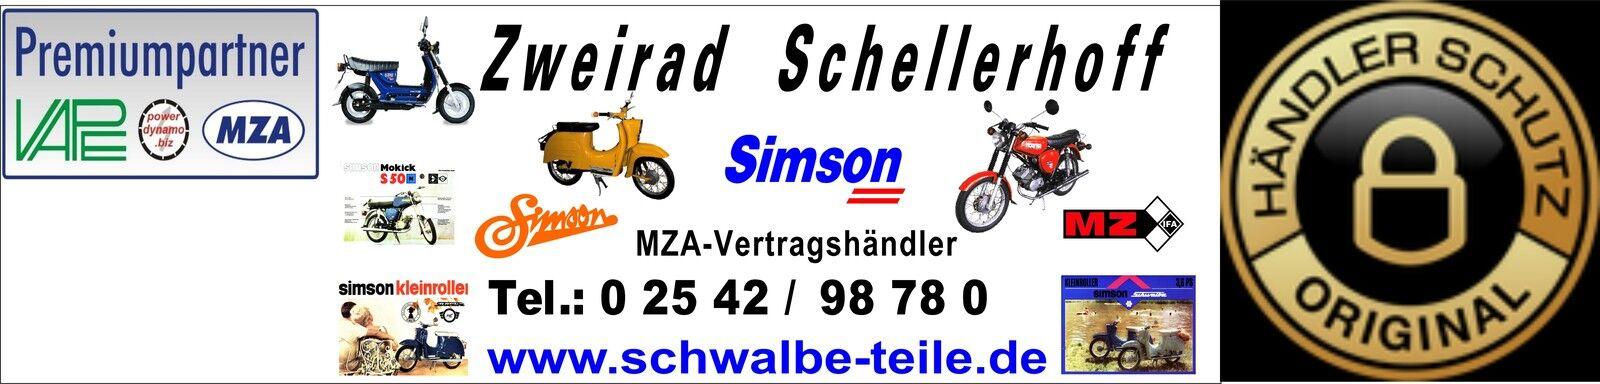 zweirad-Schellerhoff de